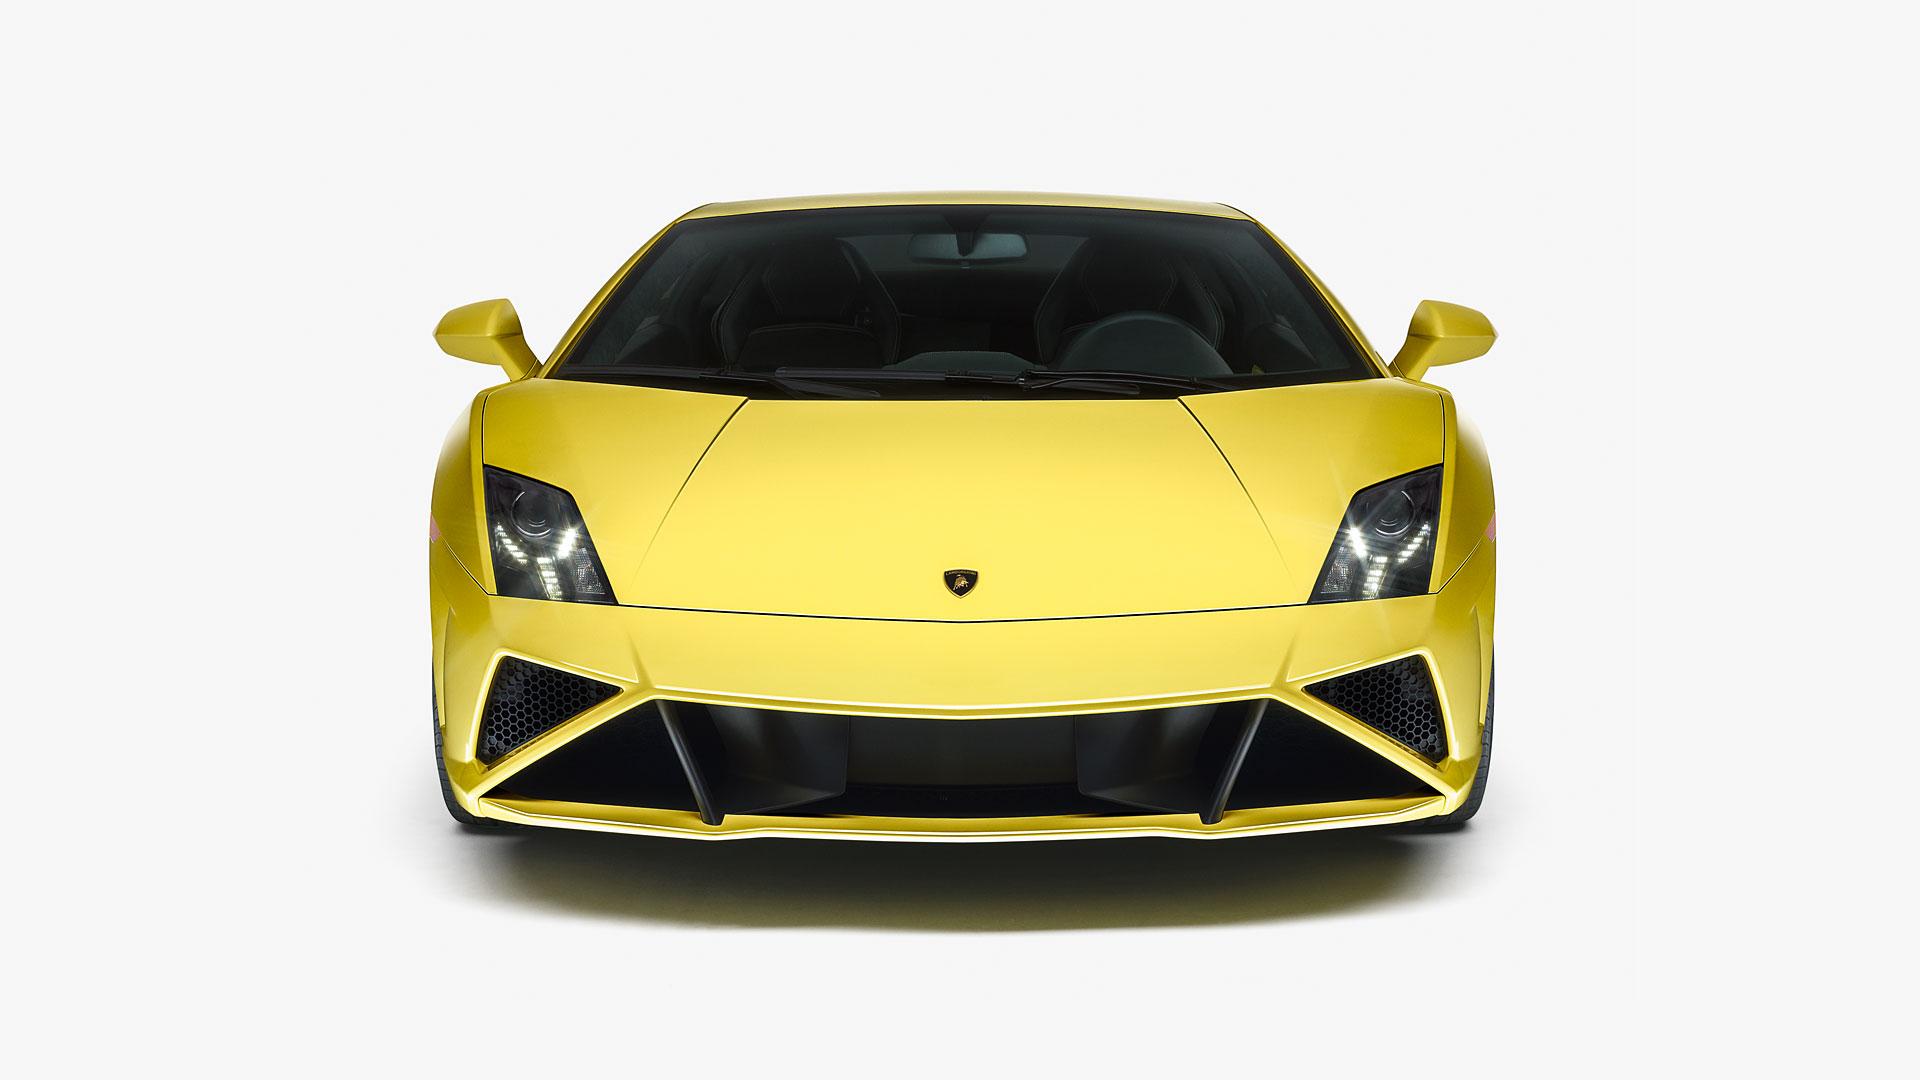 2014 Lamborghini Gallardo Lp 560 4 News And Information